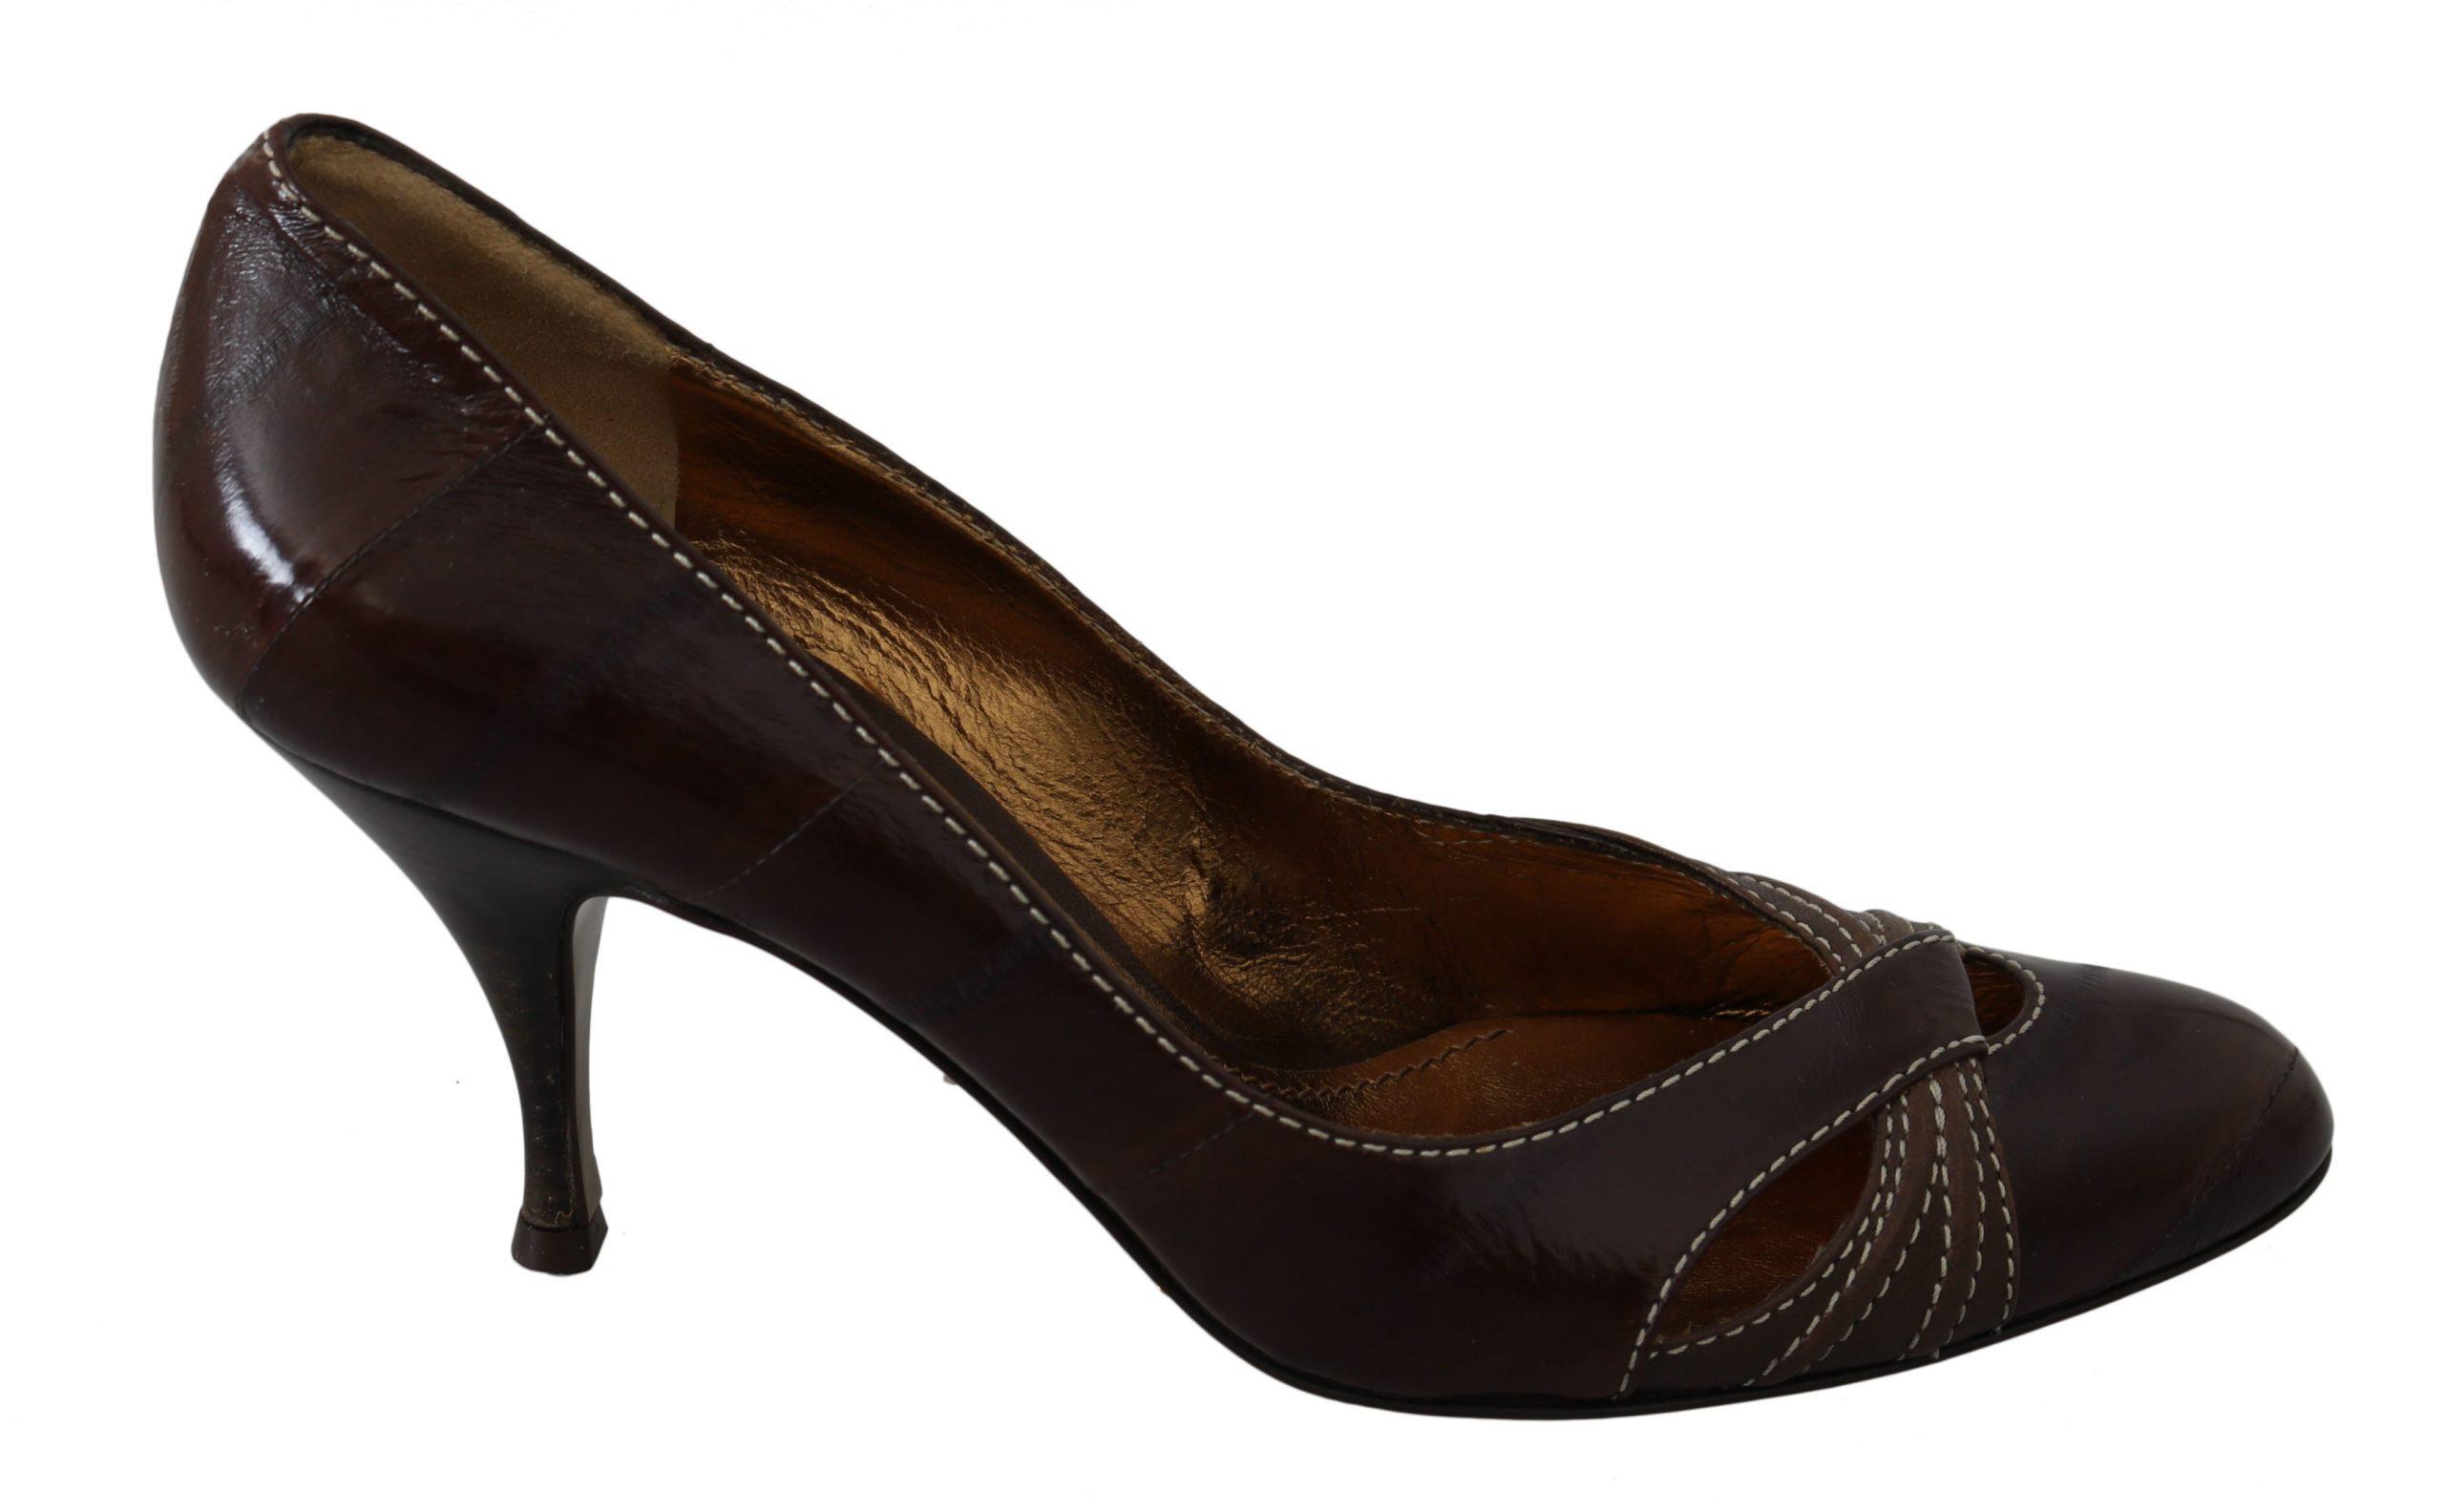 Dolce & Gabbana Women's Leather Pumps Brown LA7466 - EU39/US8.5